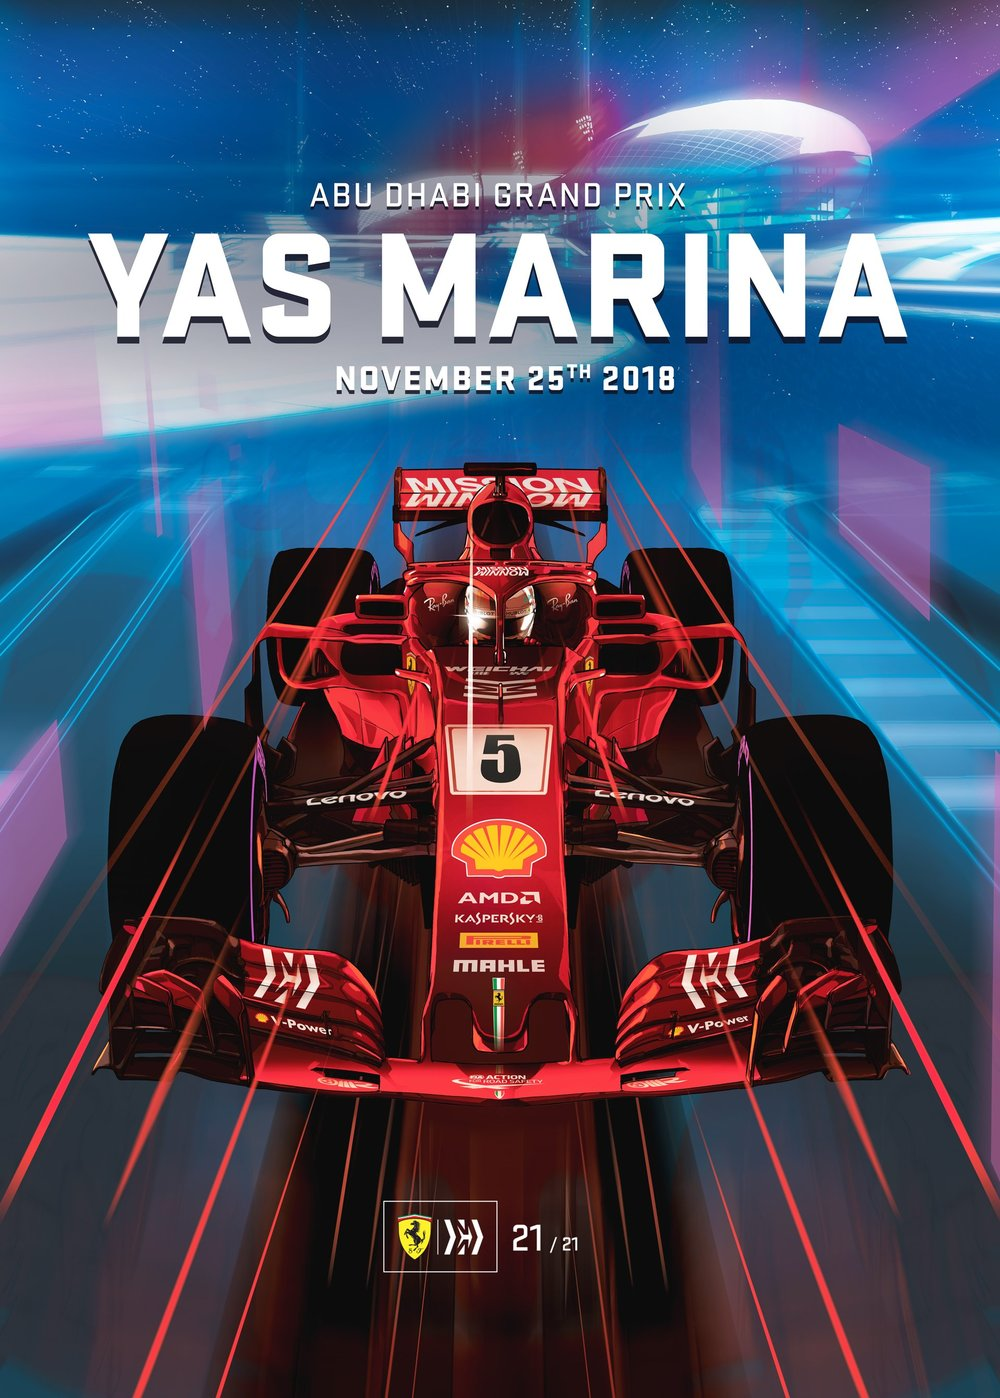 2018 Abu Dhabi Grand Prix